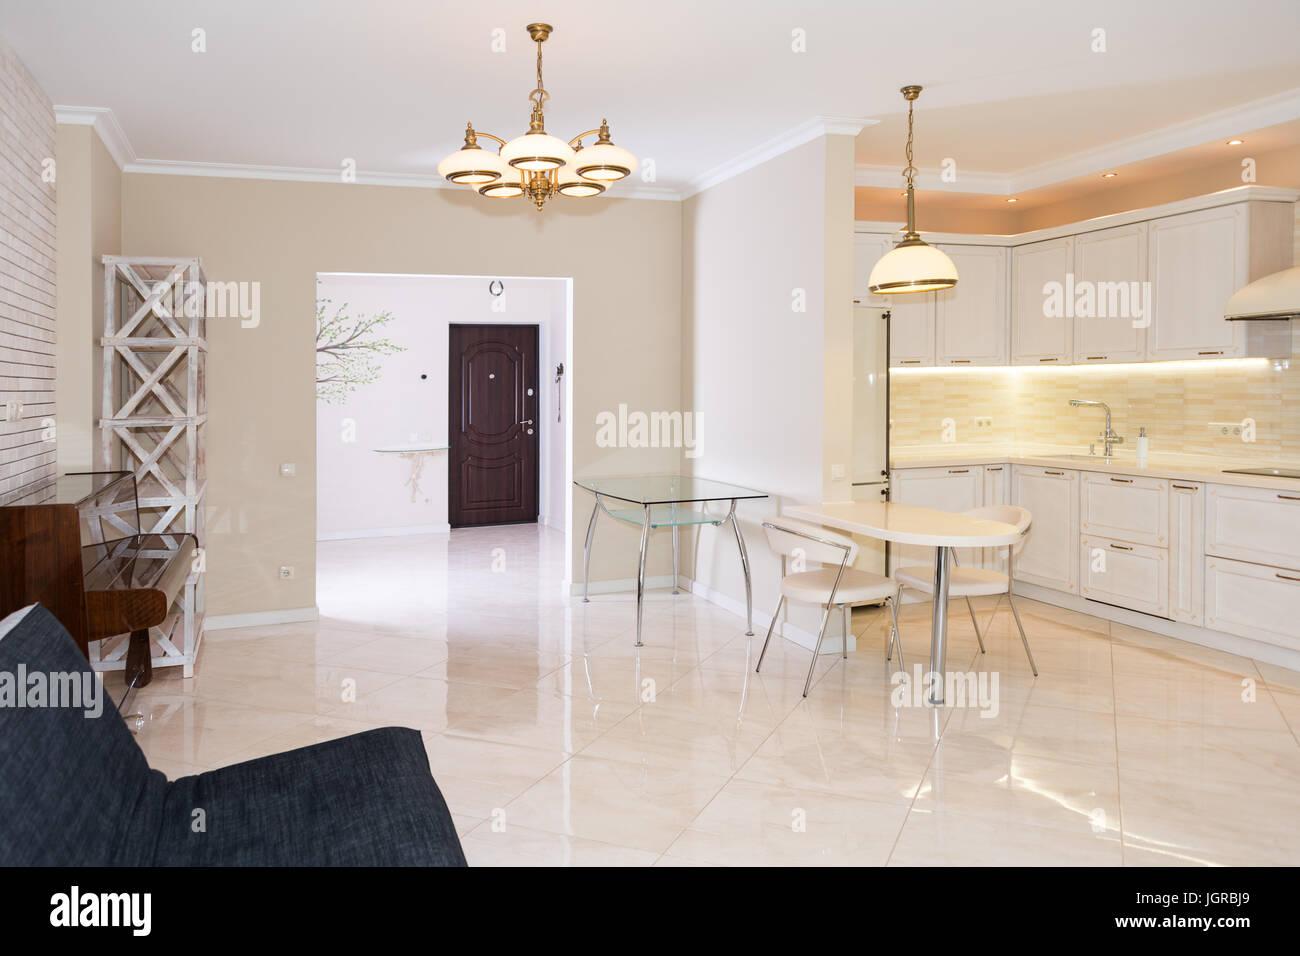 Cocina moderna zona contigua a la sala de estar. Con un diseño ...